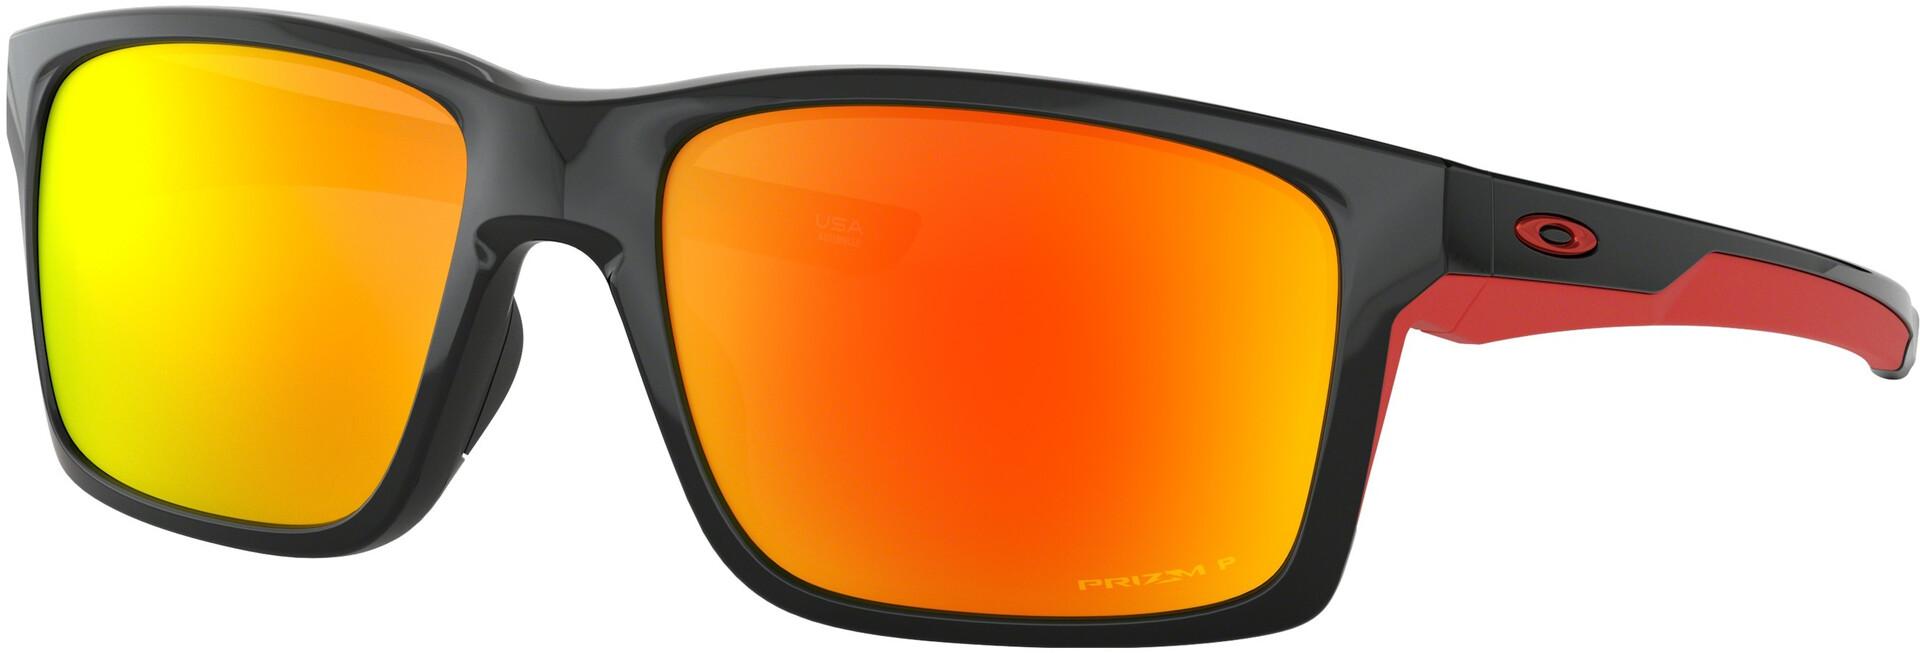 Blackprizm Polarized SunglassesPolished Mainlink Xl Ruby Oakley Kl1JFTc3